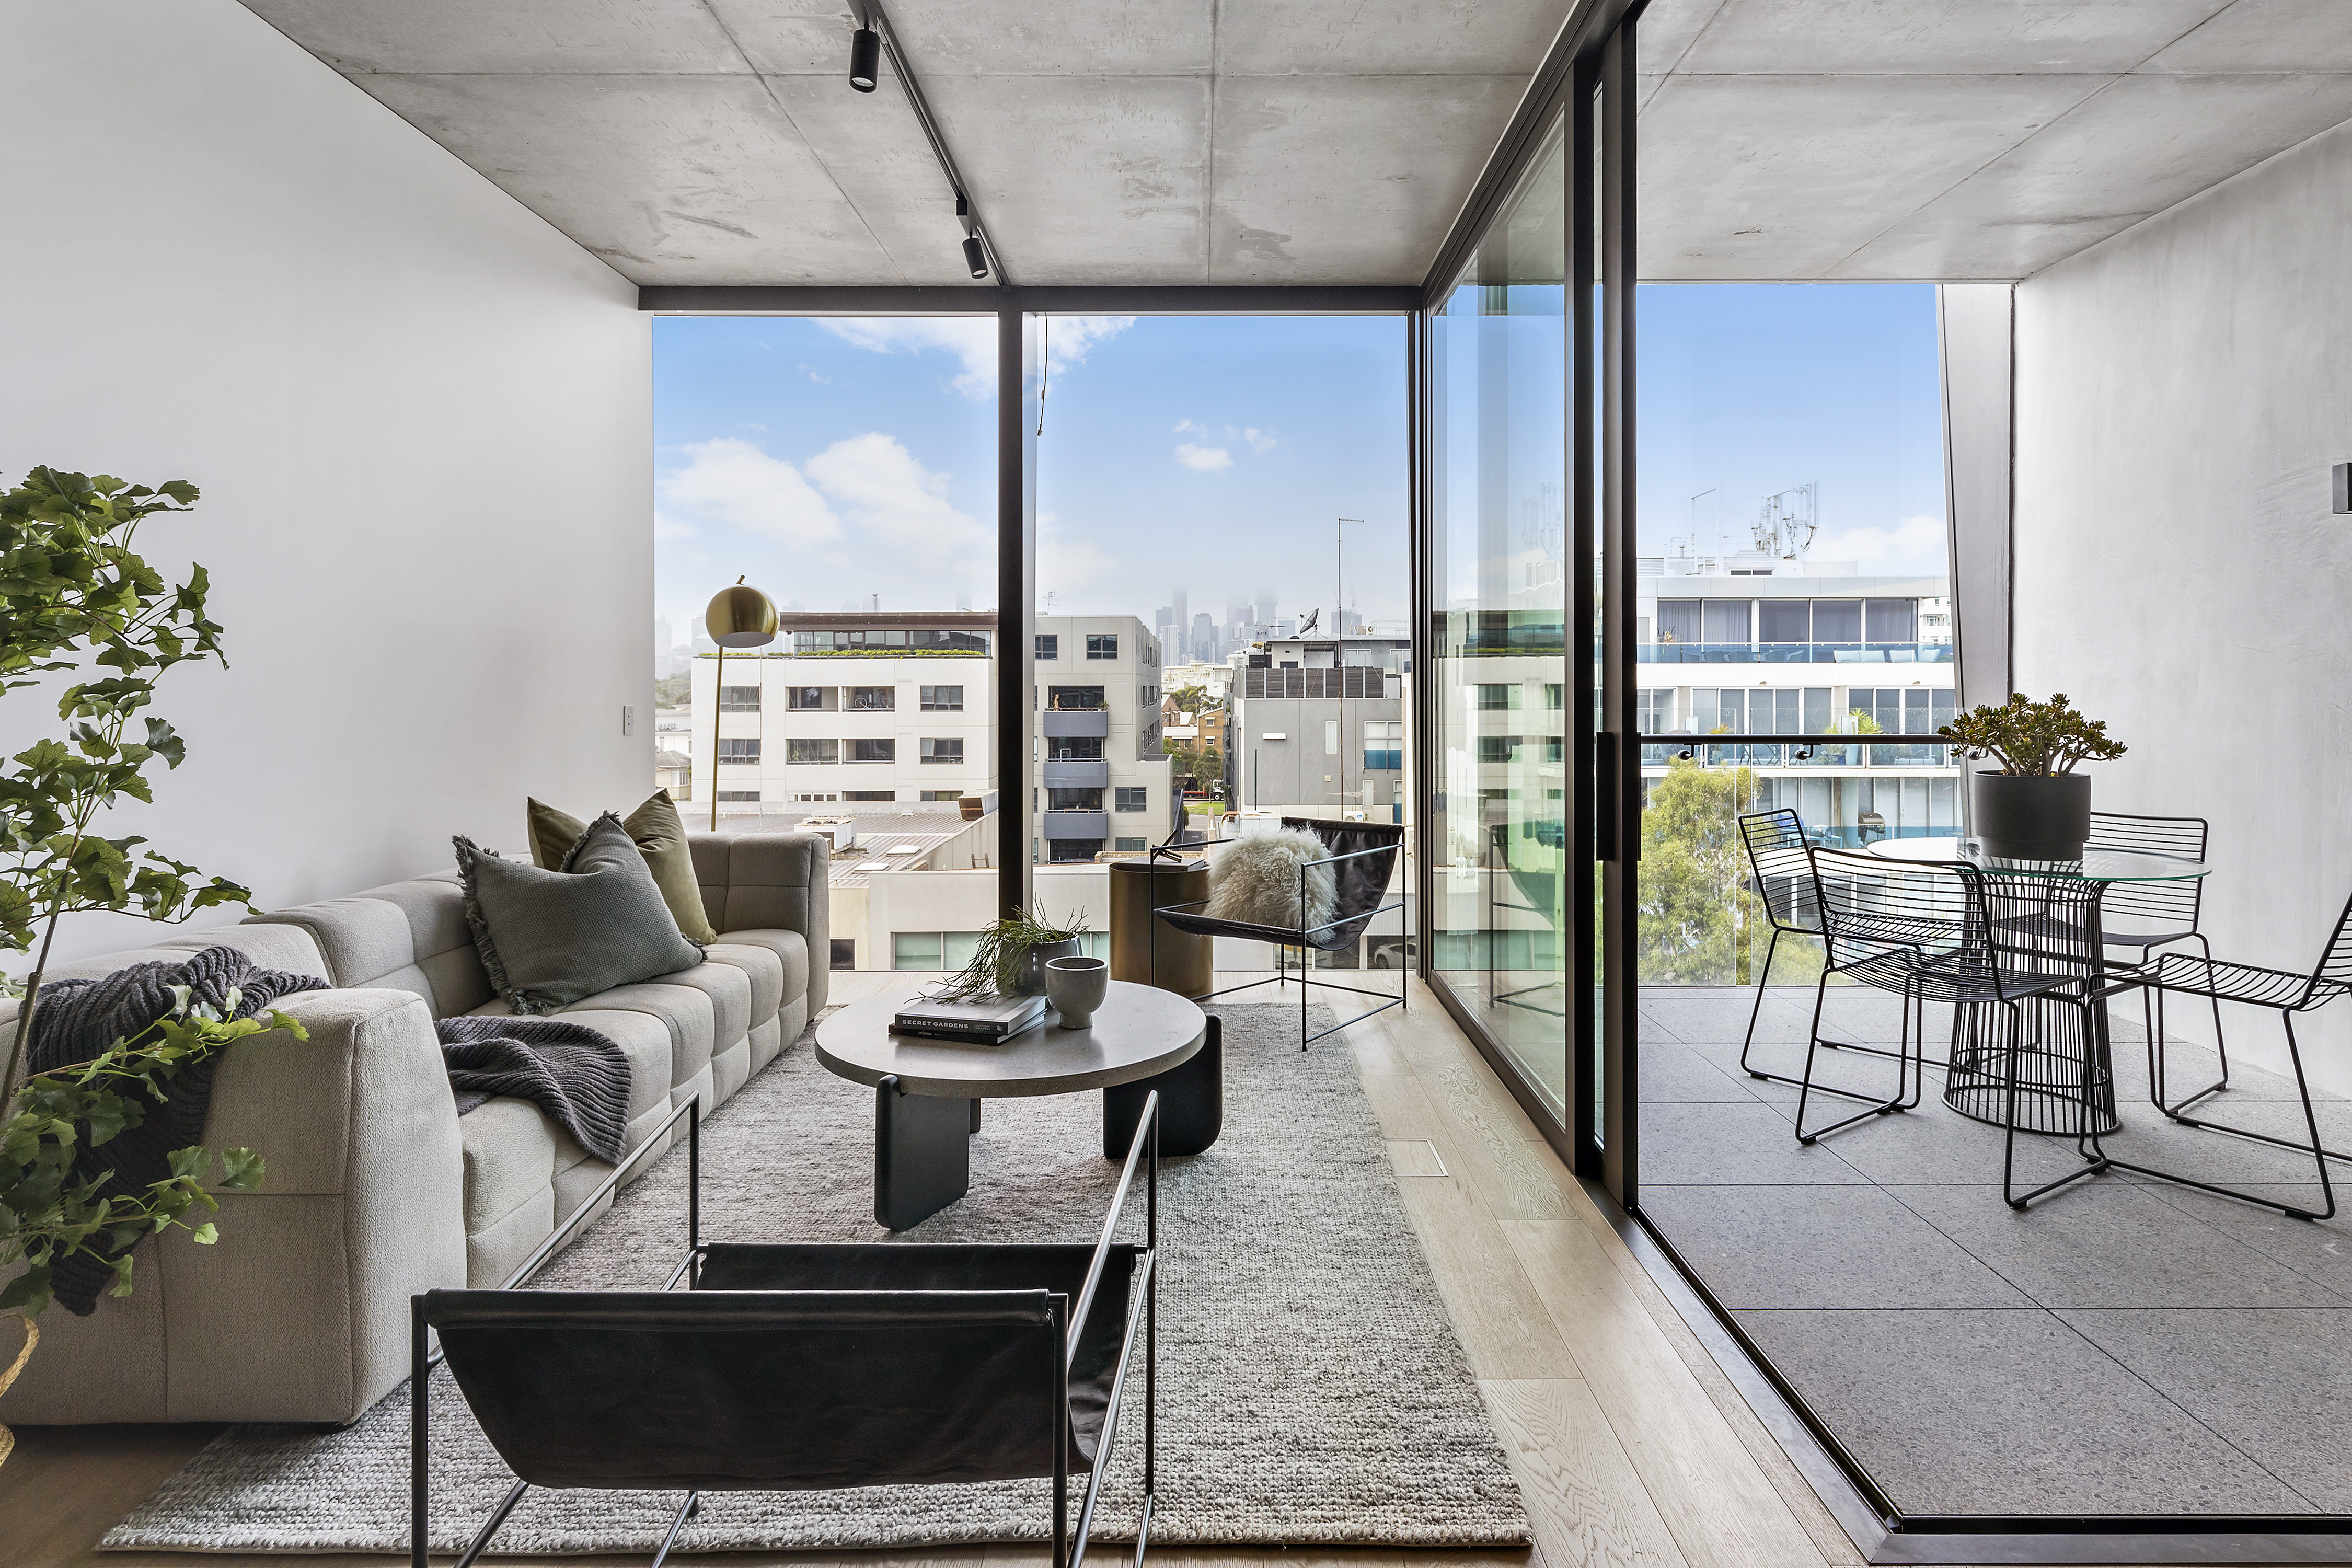 405-9-johnston-street-port-melbourne-student-accommodation-Melbourne-Living-Area-Unilodgers